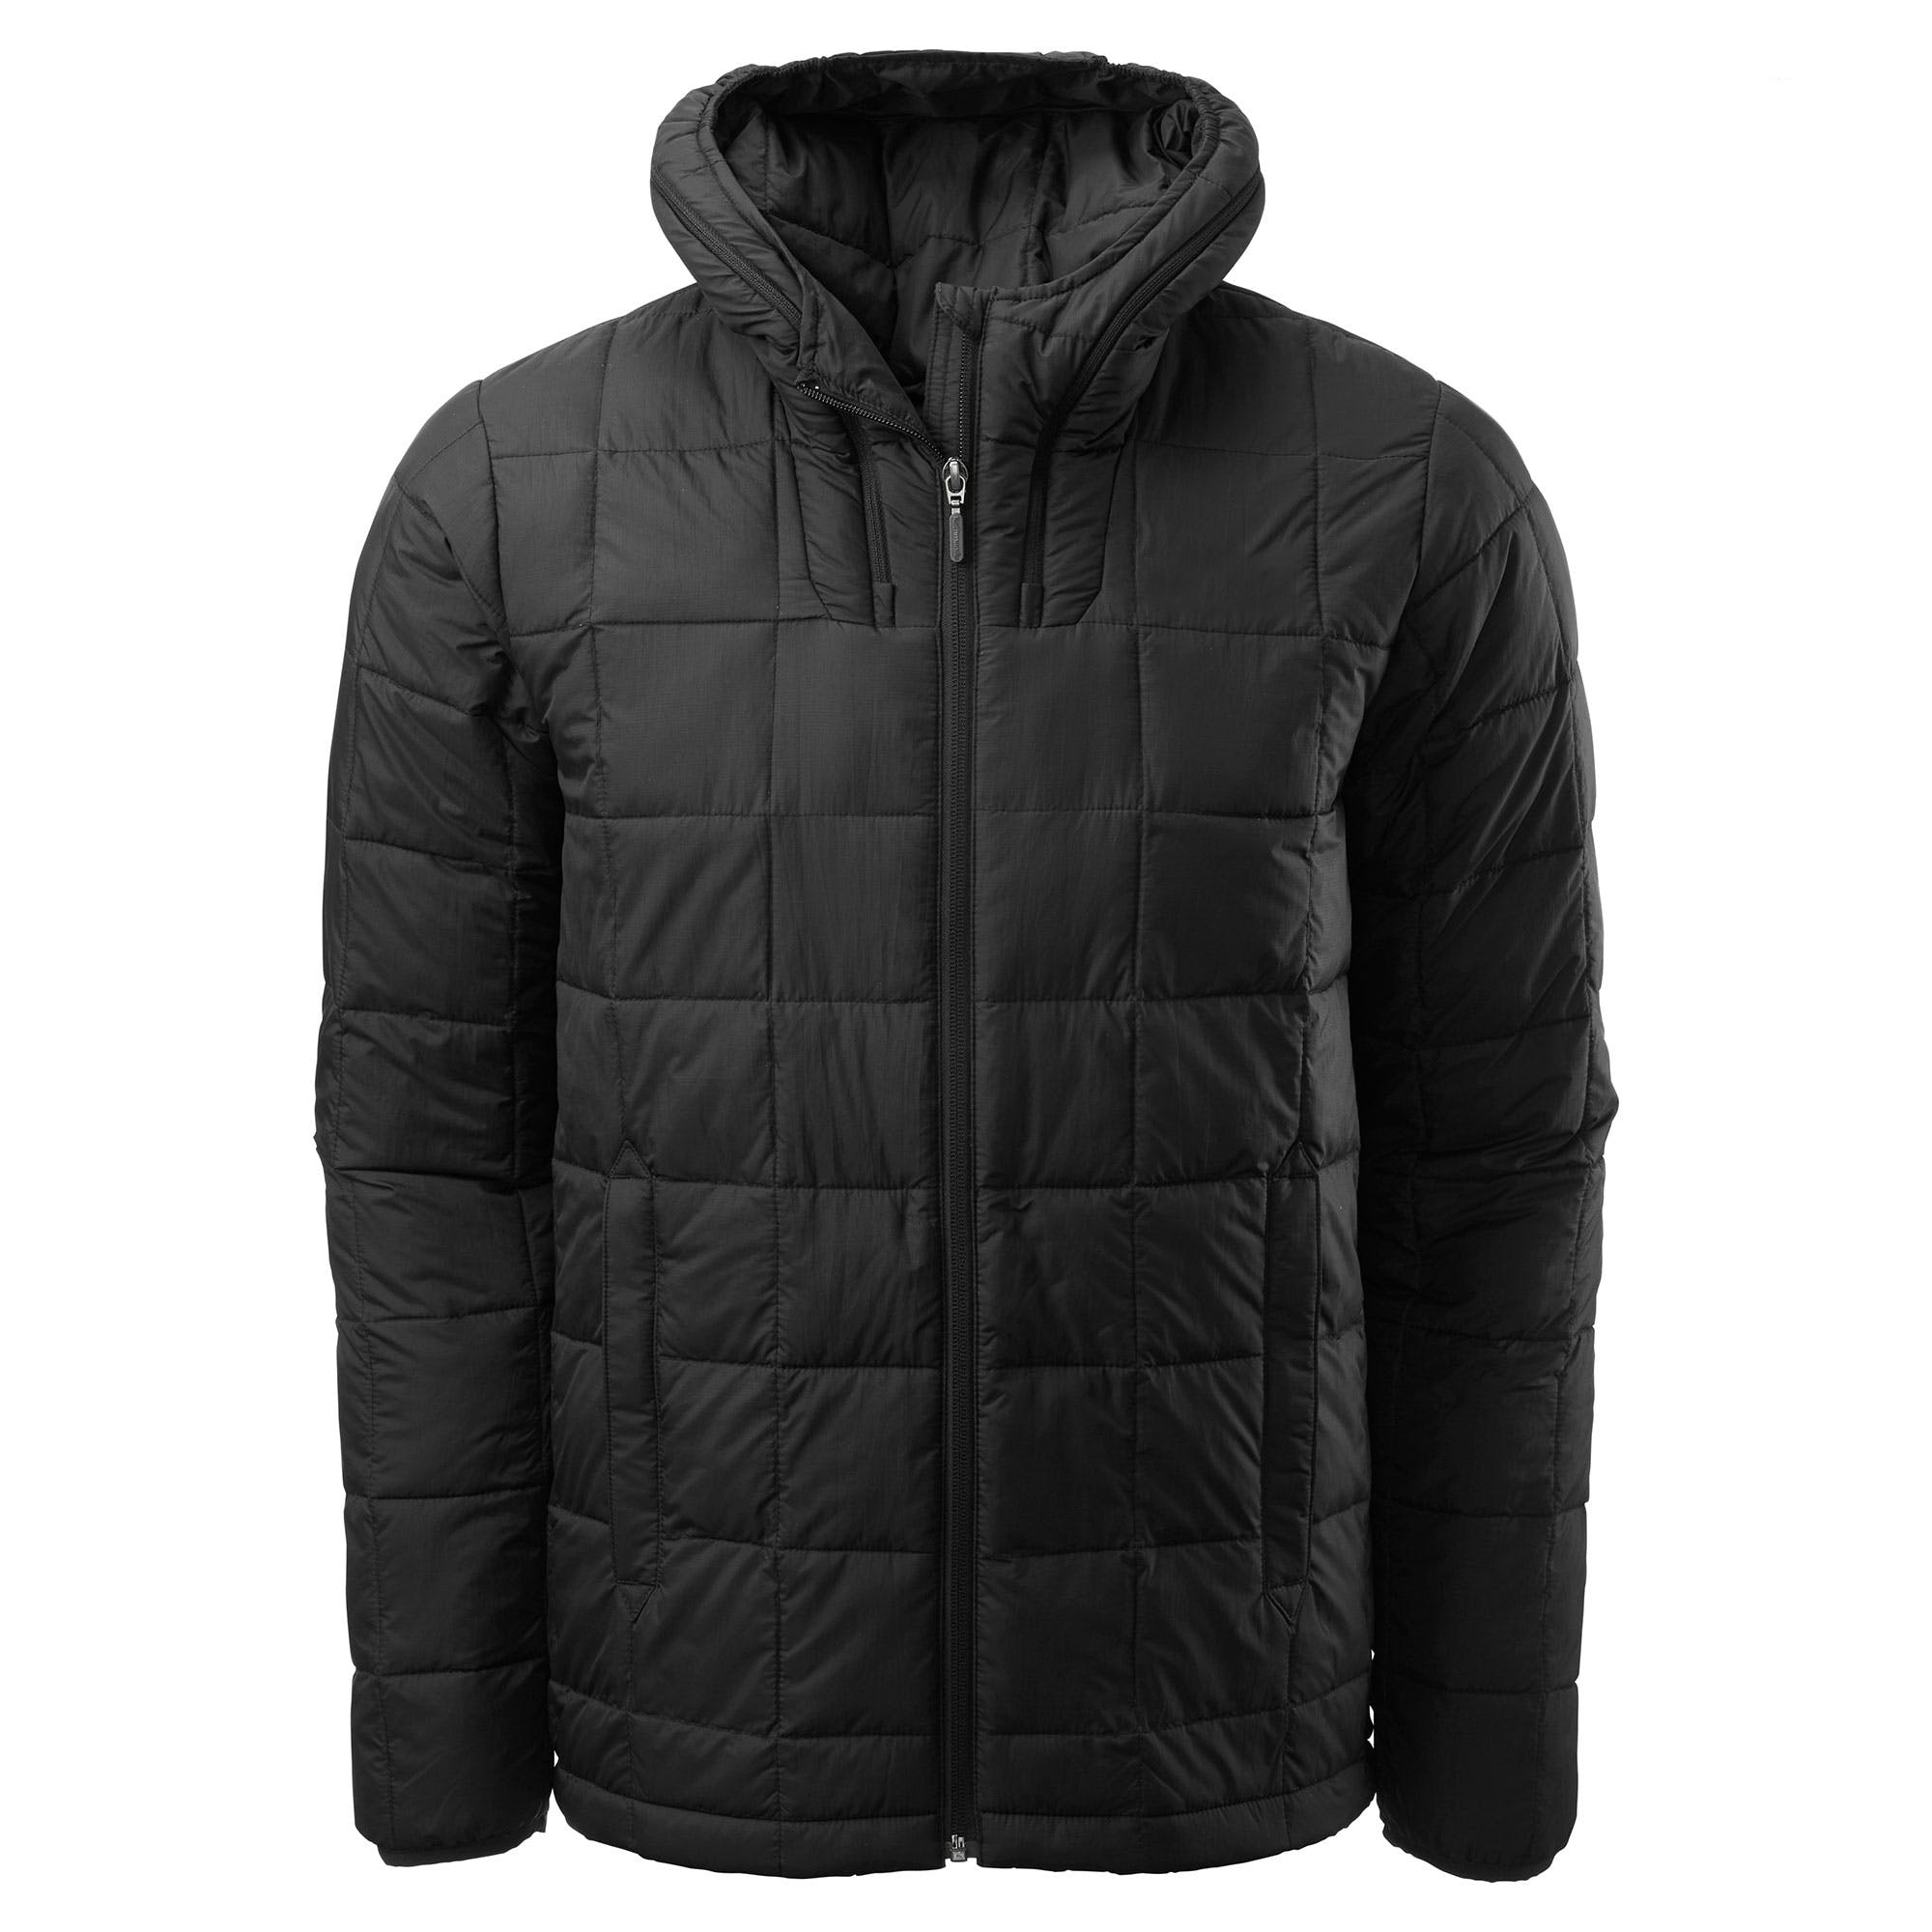 Men's Insulated Jacket Manufacturers, Men's Insulated Jacket Factory, Supply Men's Insulated Jacket